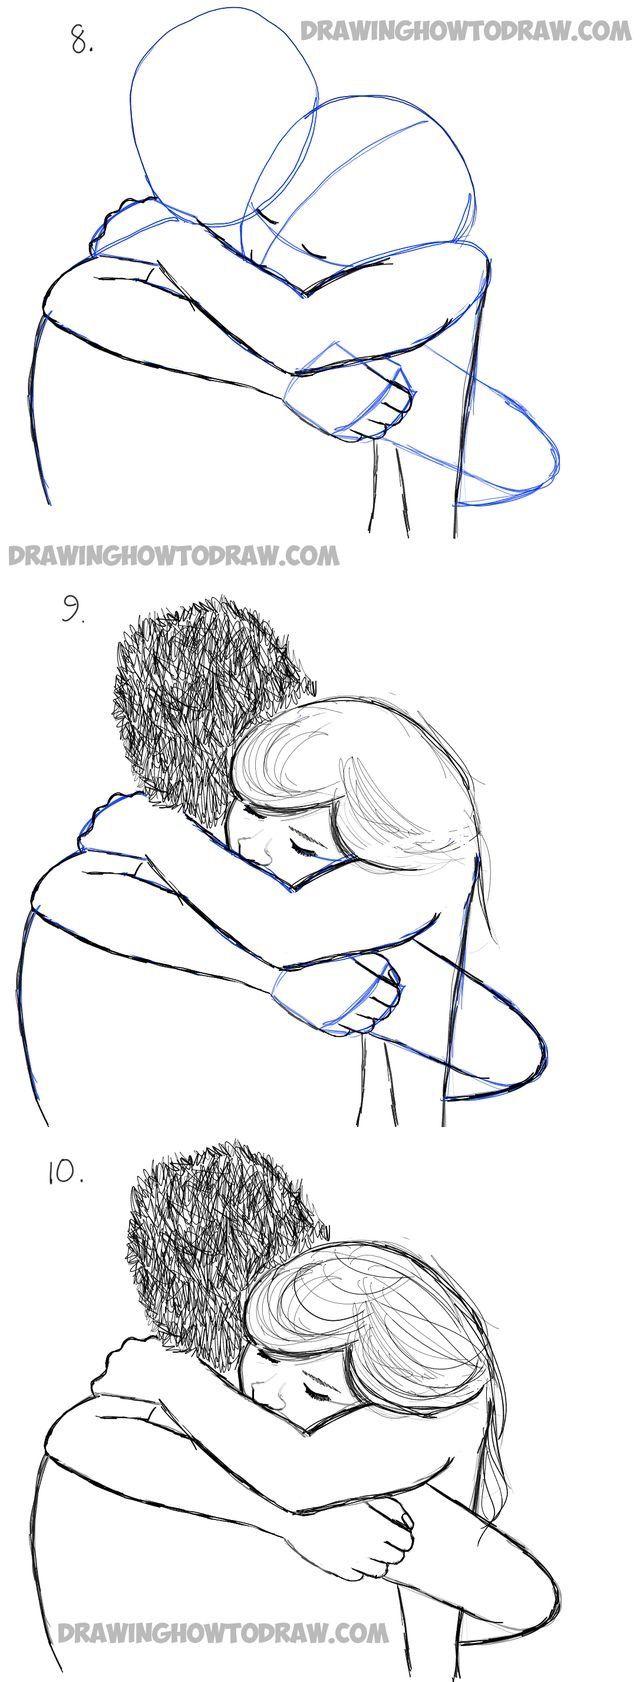 Pin oleh LUCKYANSYAH di desenhos Cara menggambar, Sketsa